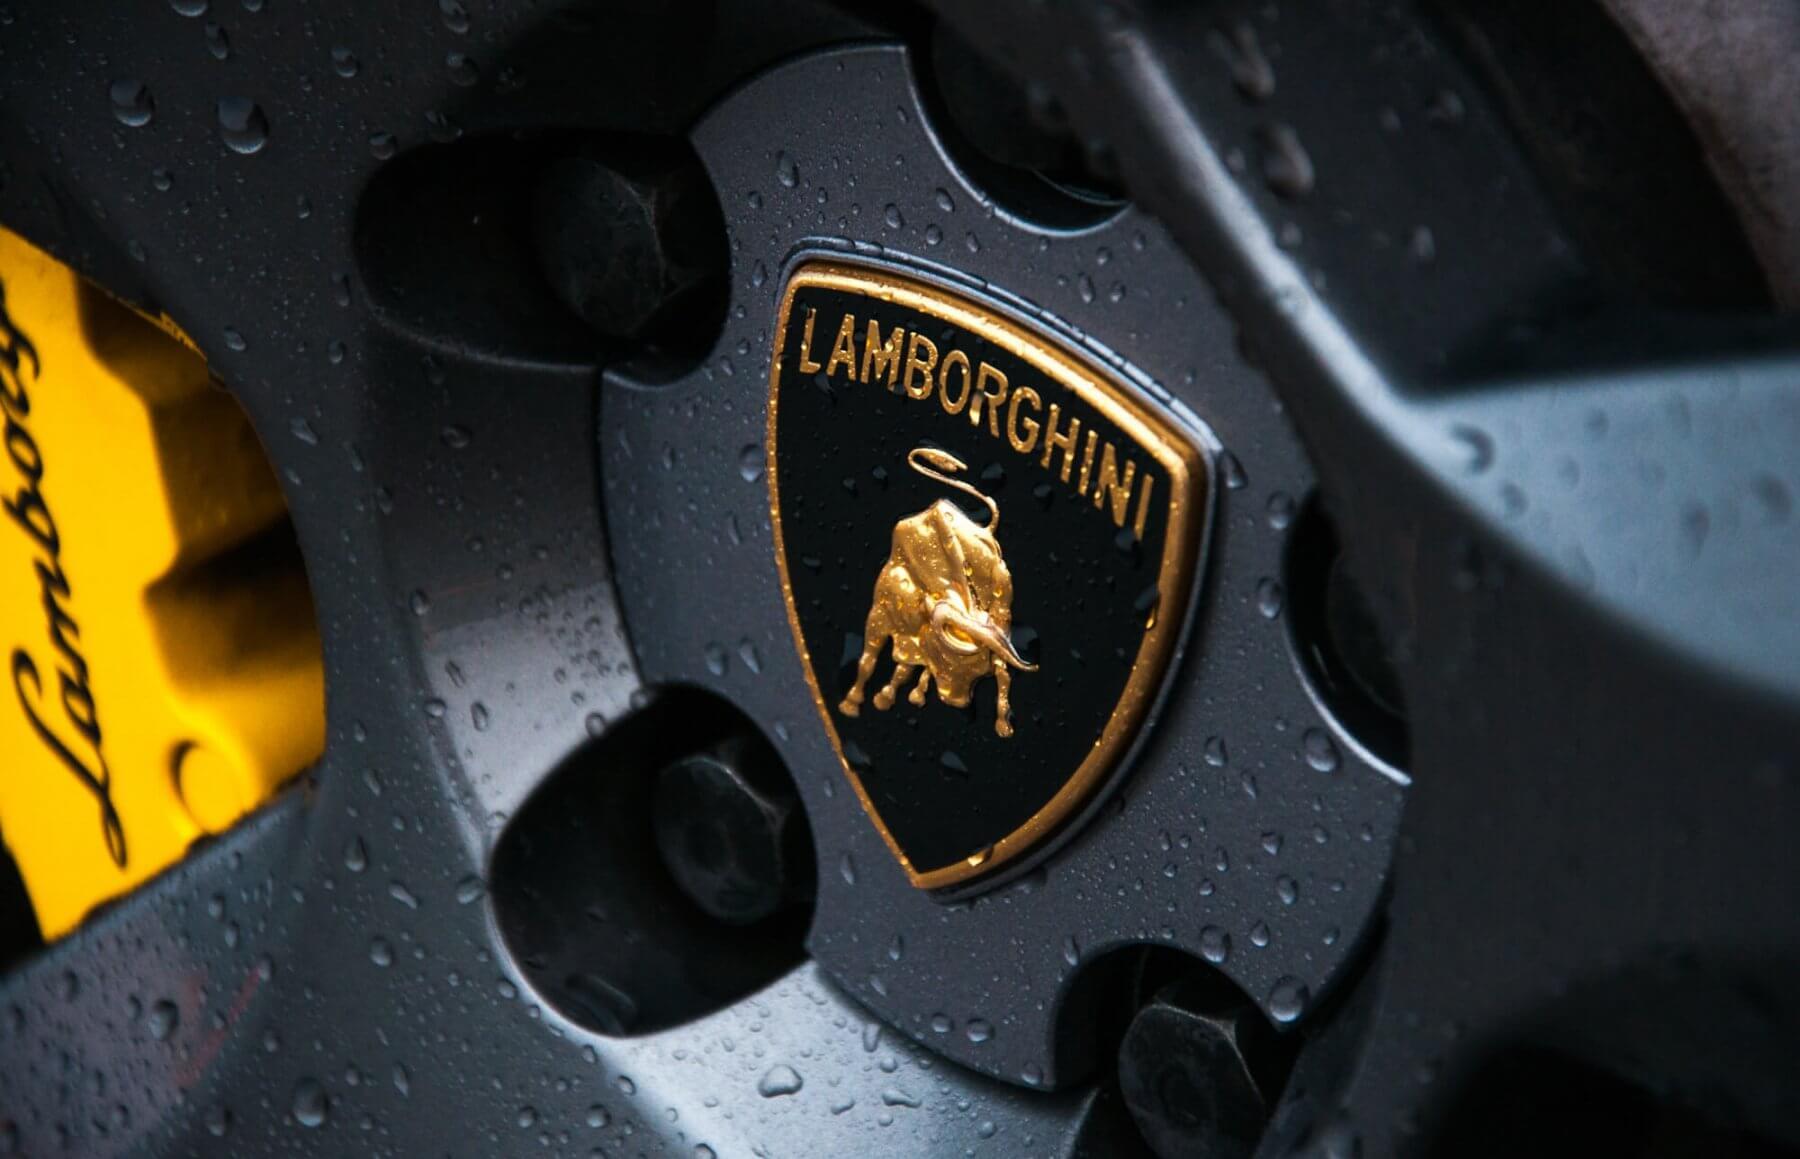 Wyjątkowa jazda Lamborghini Gallardo